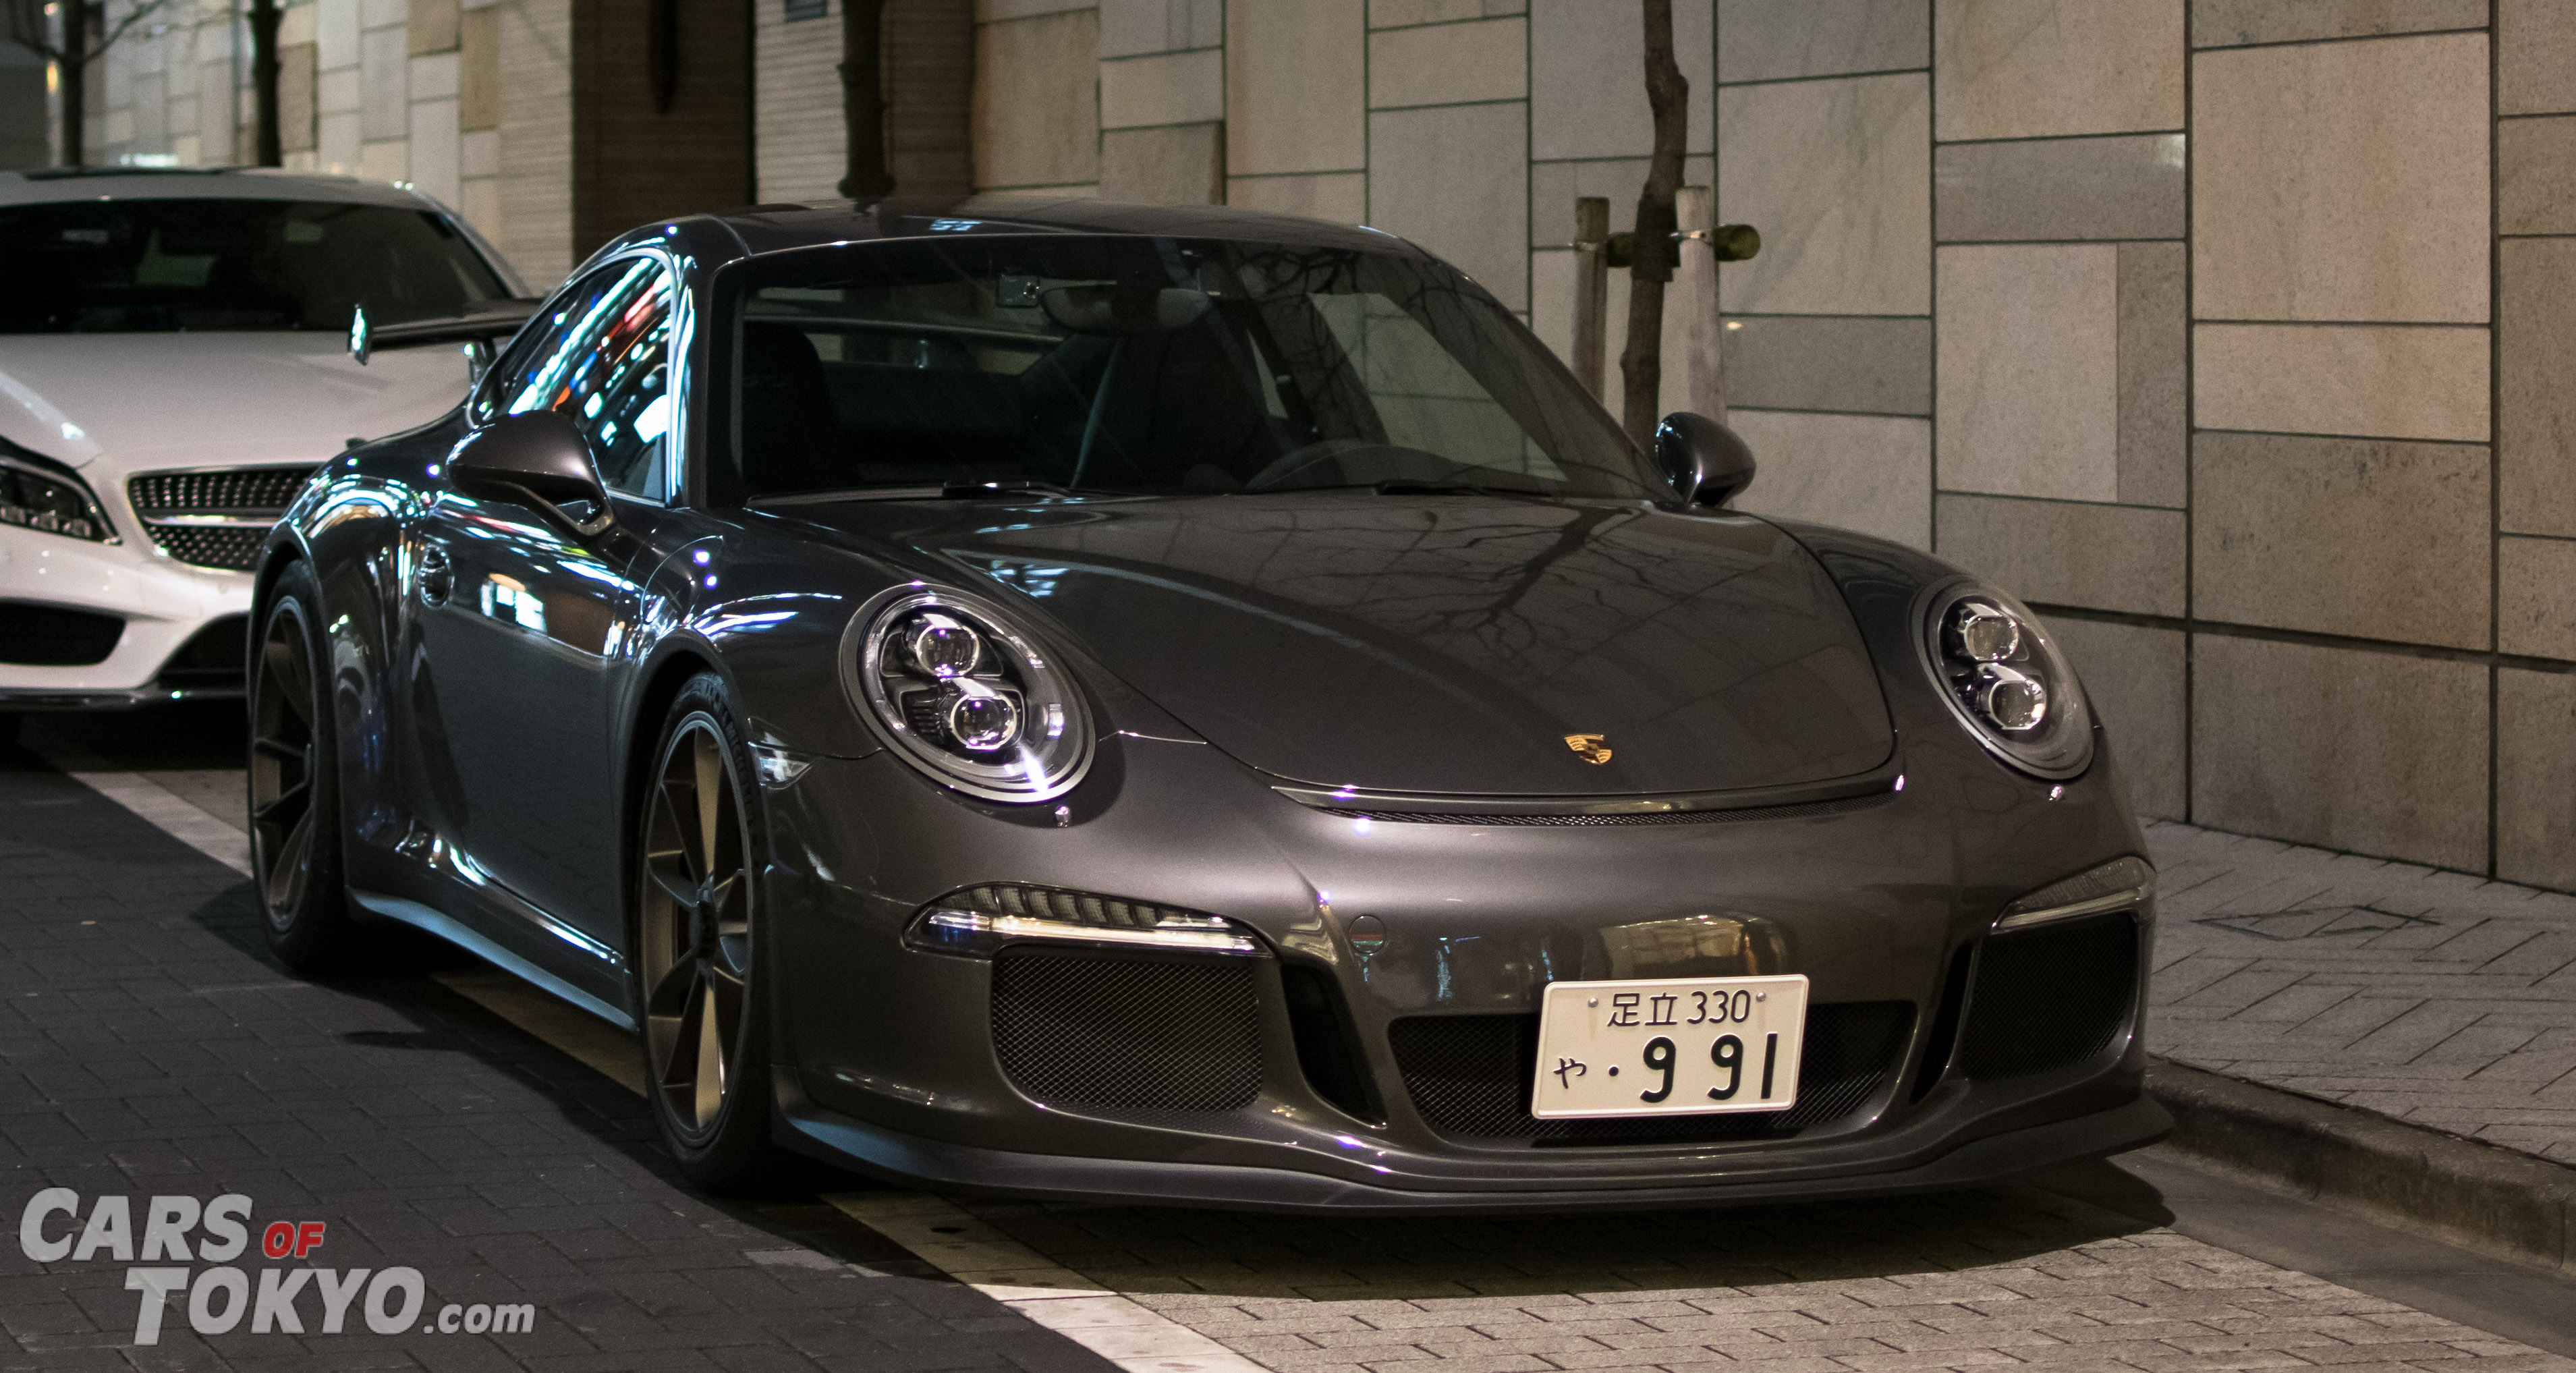 Cars of Tokyo Ginza Porsche 911 GT3